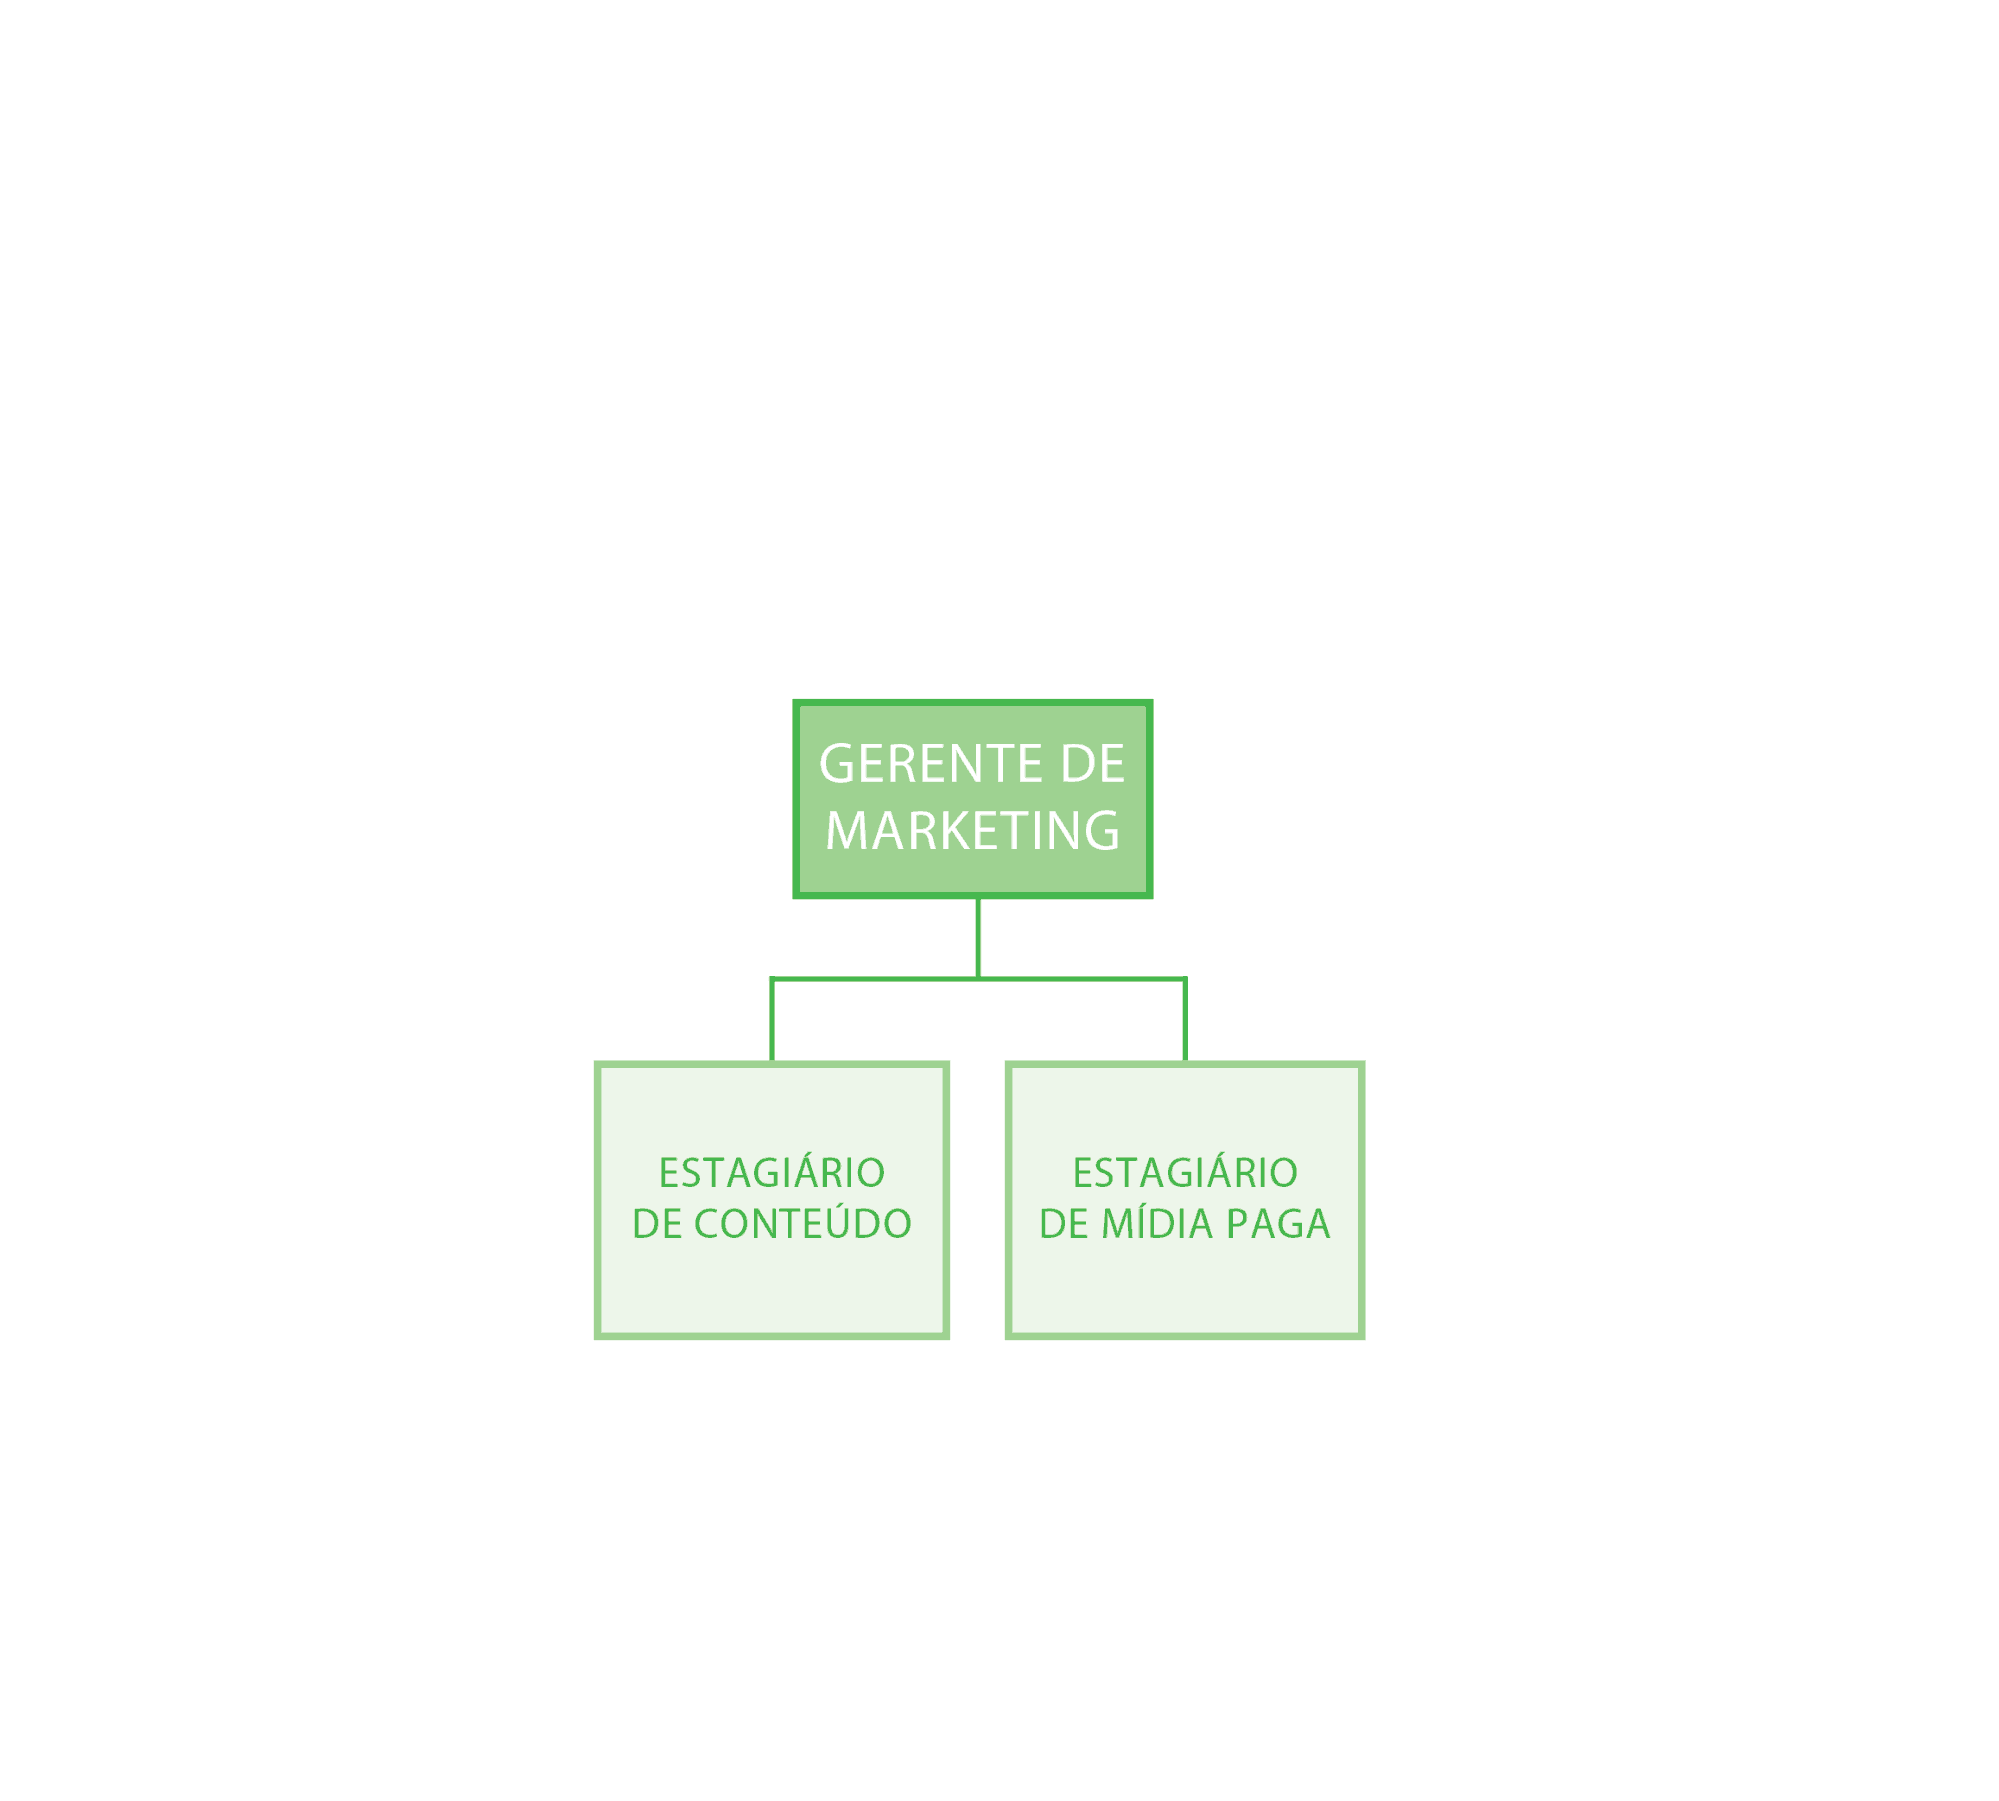 Estrutura equipe de marketing Xerpa